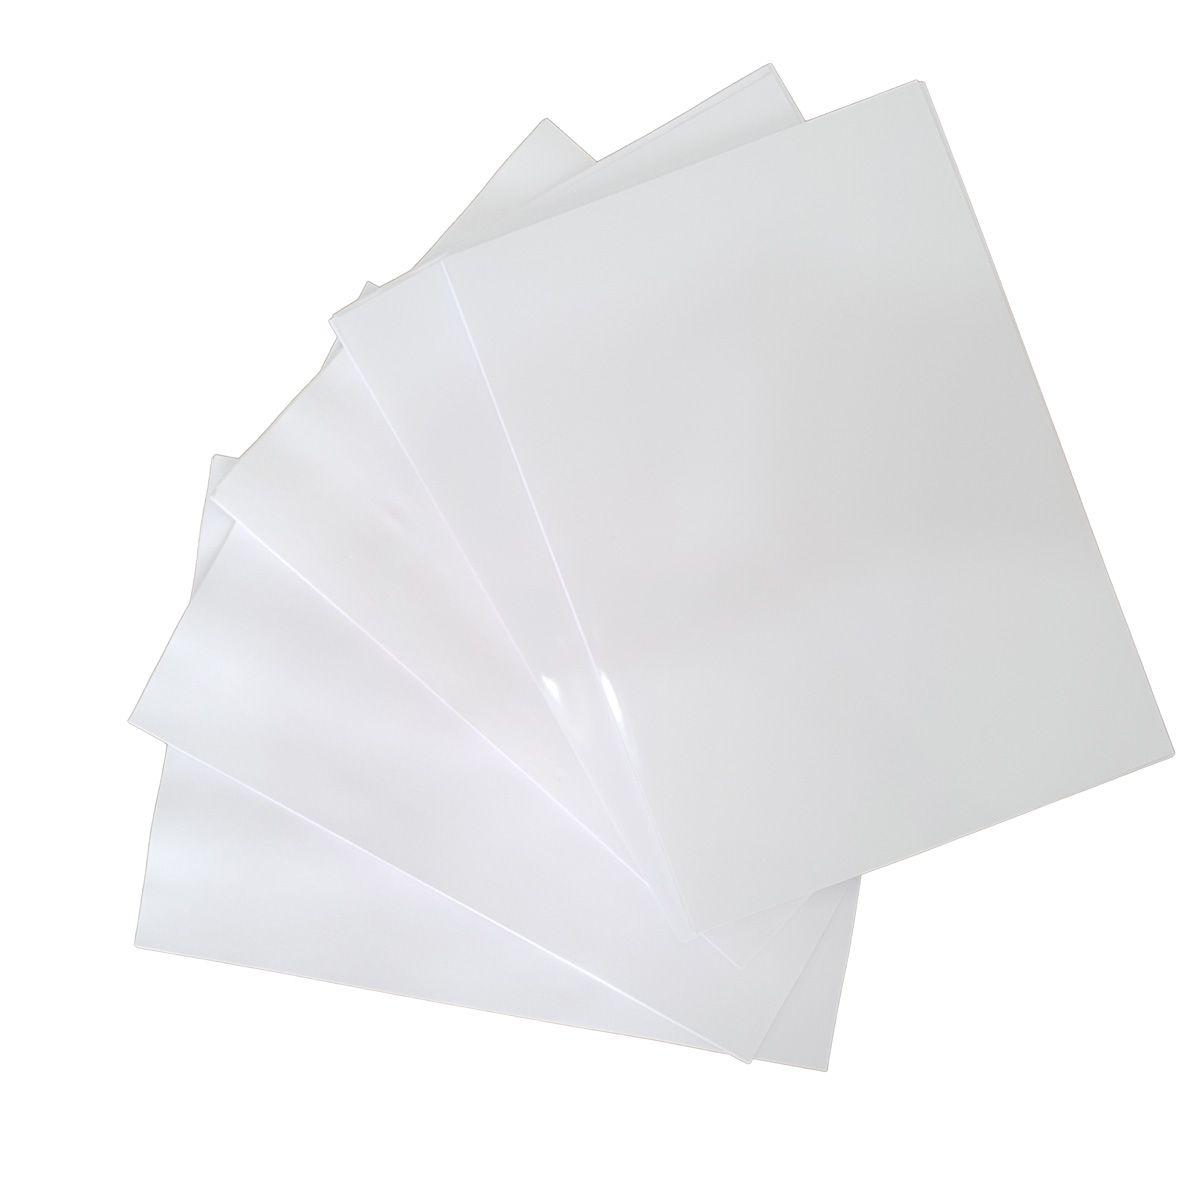 80 Adesivos Vinil Transparentes Impressoras Jato De Tinta A4